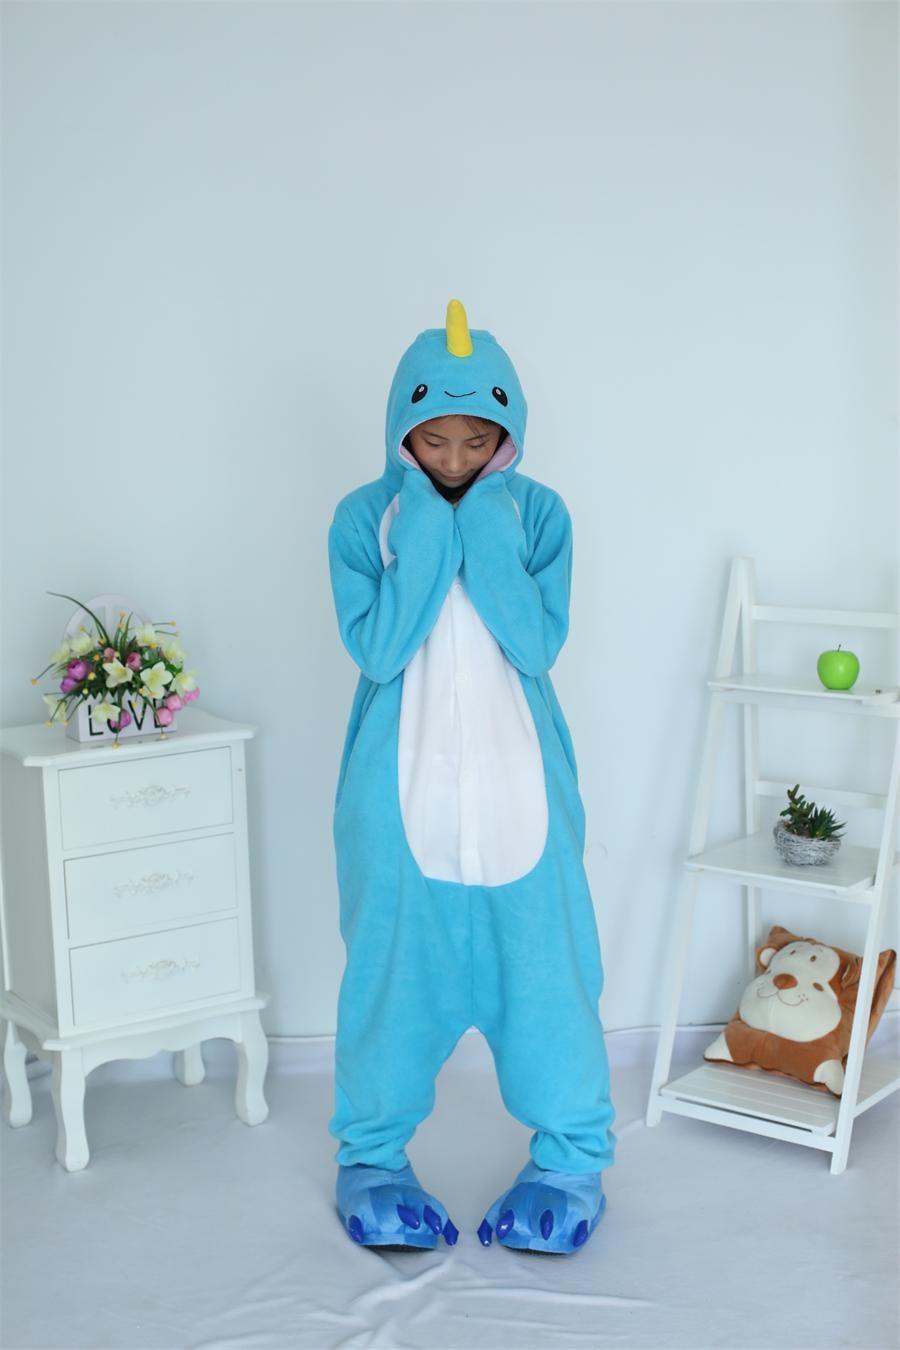 For Halloween Christmas New Adult Narwhal Pajamas Animal Cosplay Costume Sleepwear Pyjamas Unisex Onesies Cartoon Sleepsuit